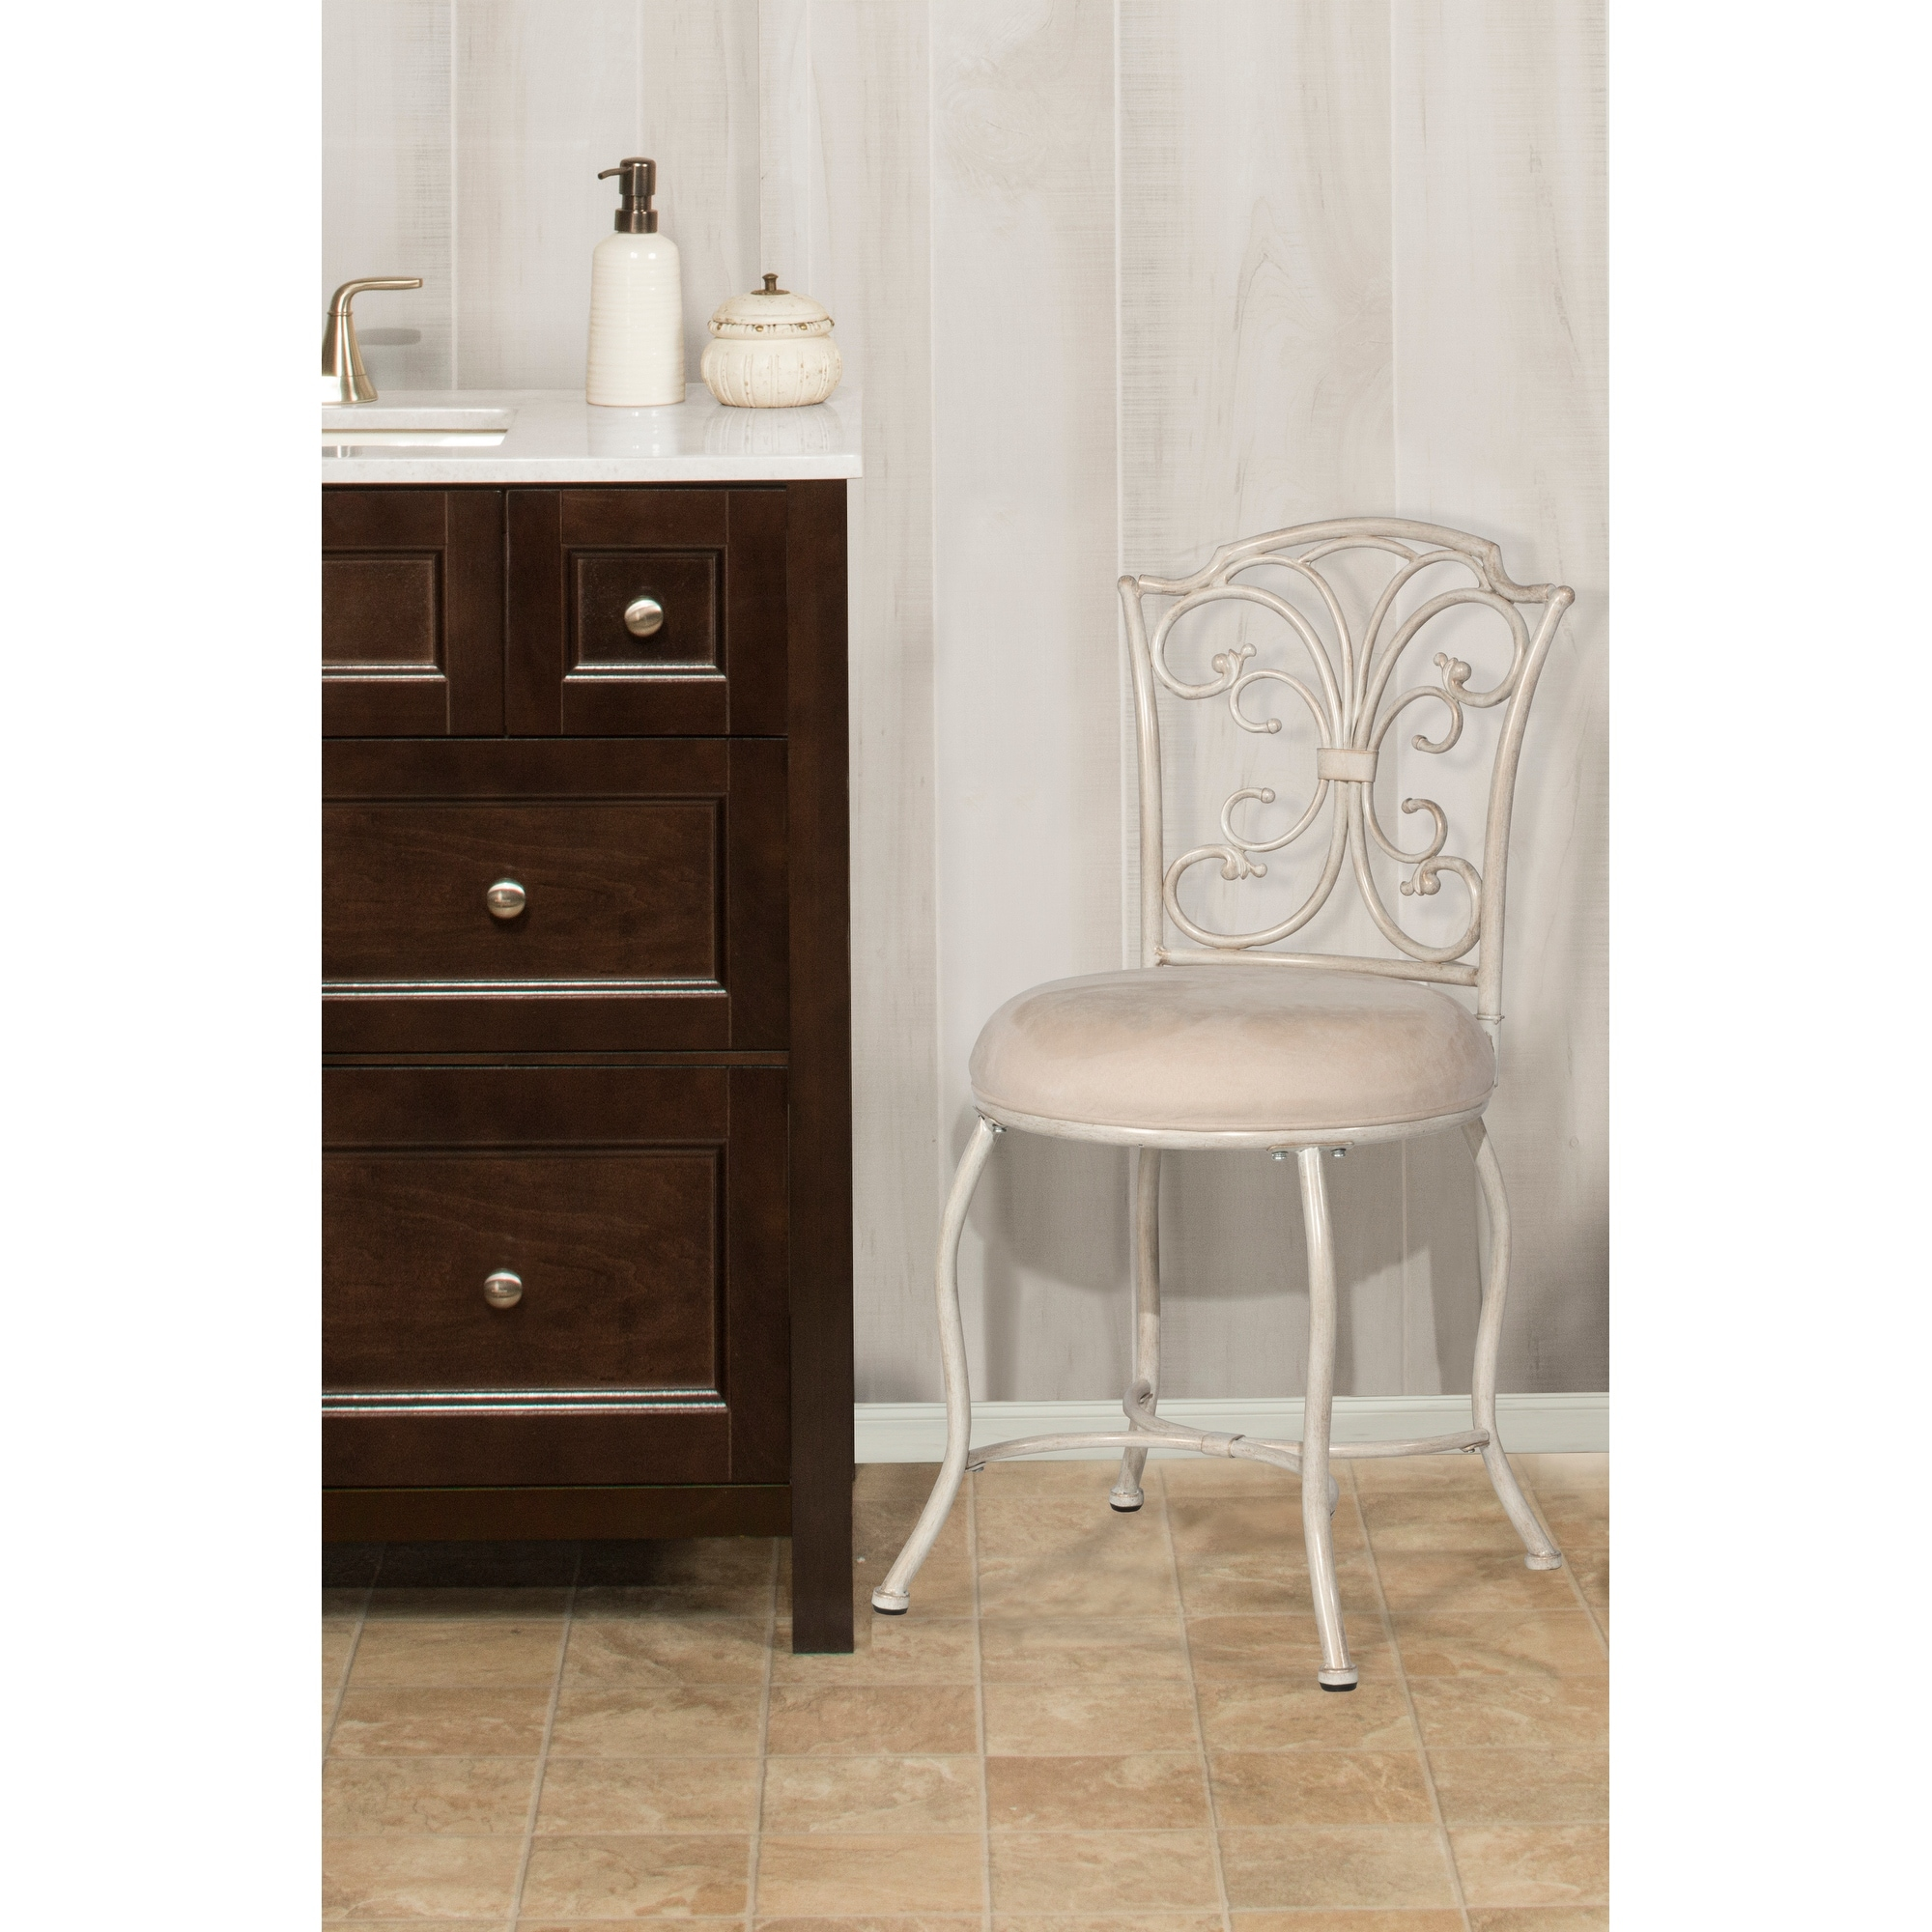 Image of: Shop Black Friday Deals On Hillsdale Furniture Sparta Metal Vanity Stool 16 X 18 5 X 32 5 Overstock 22724571 Black Gold